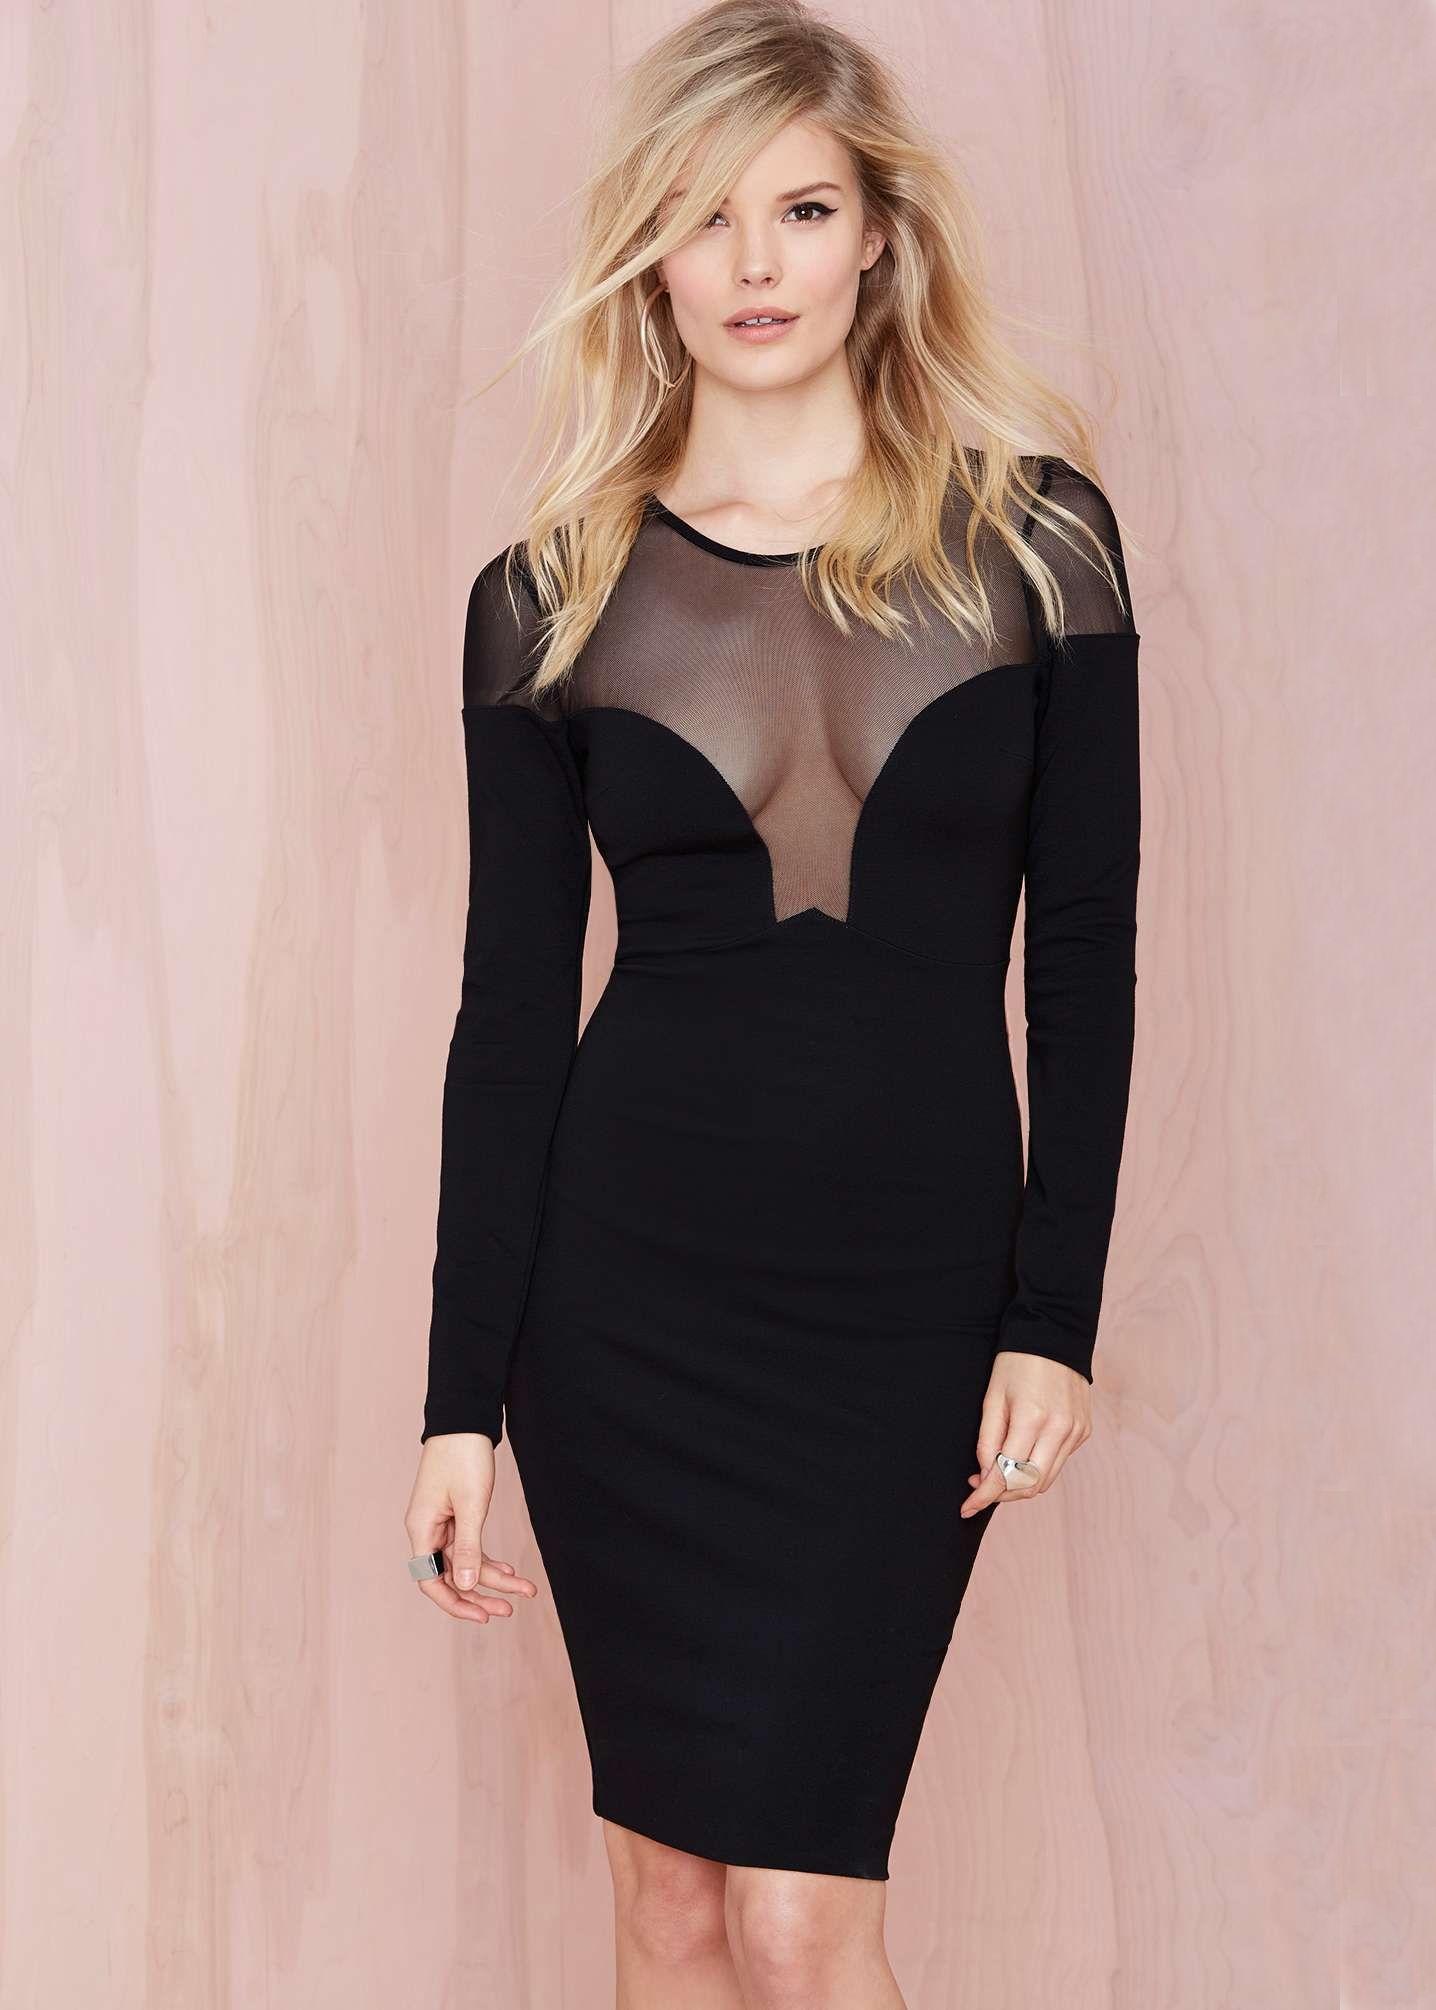 Shop black long sleeve contrast mesh yoke sheath dress online